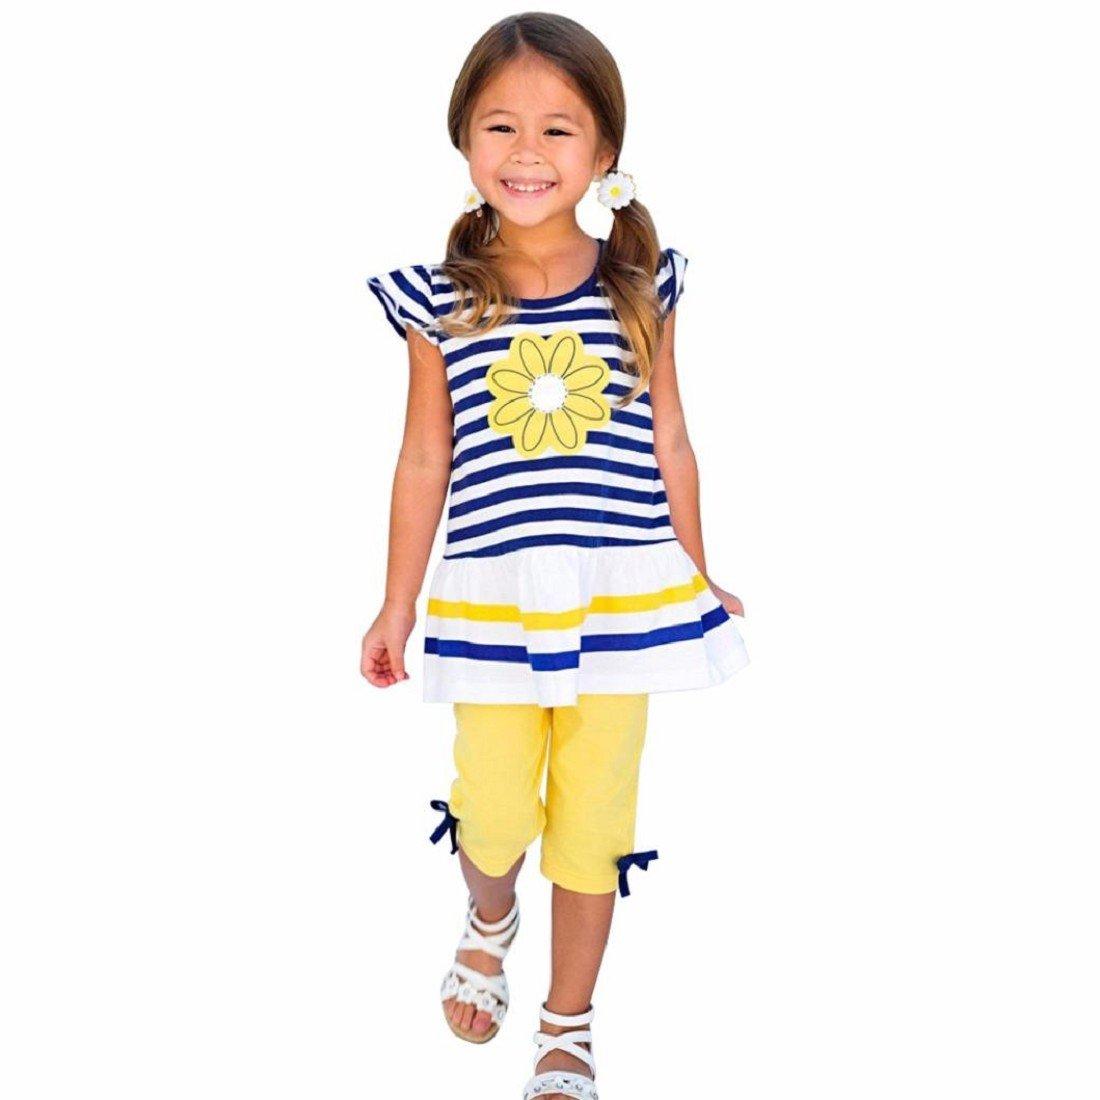 Orangeskycn Kids Girls Daisy Flower Stripe Shirt Top Bow Pant Set Clothing Orangesky 1063